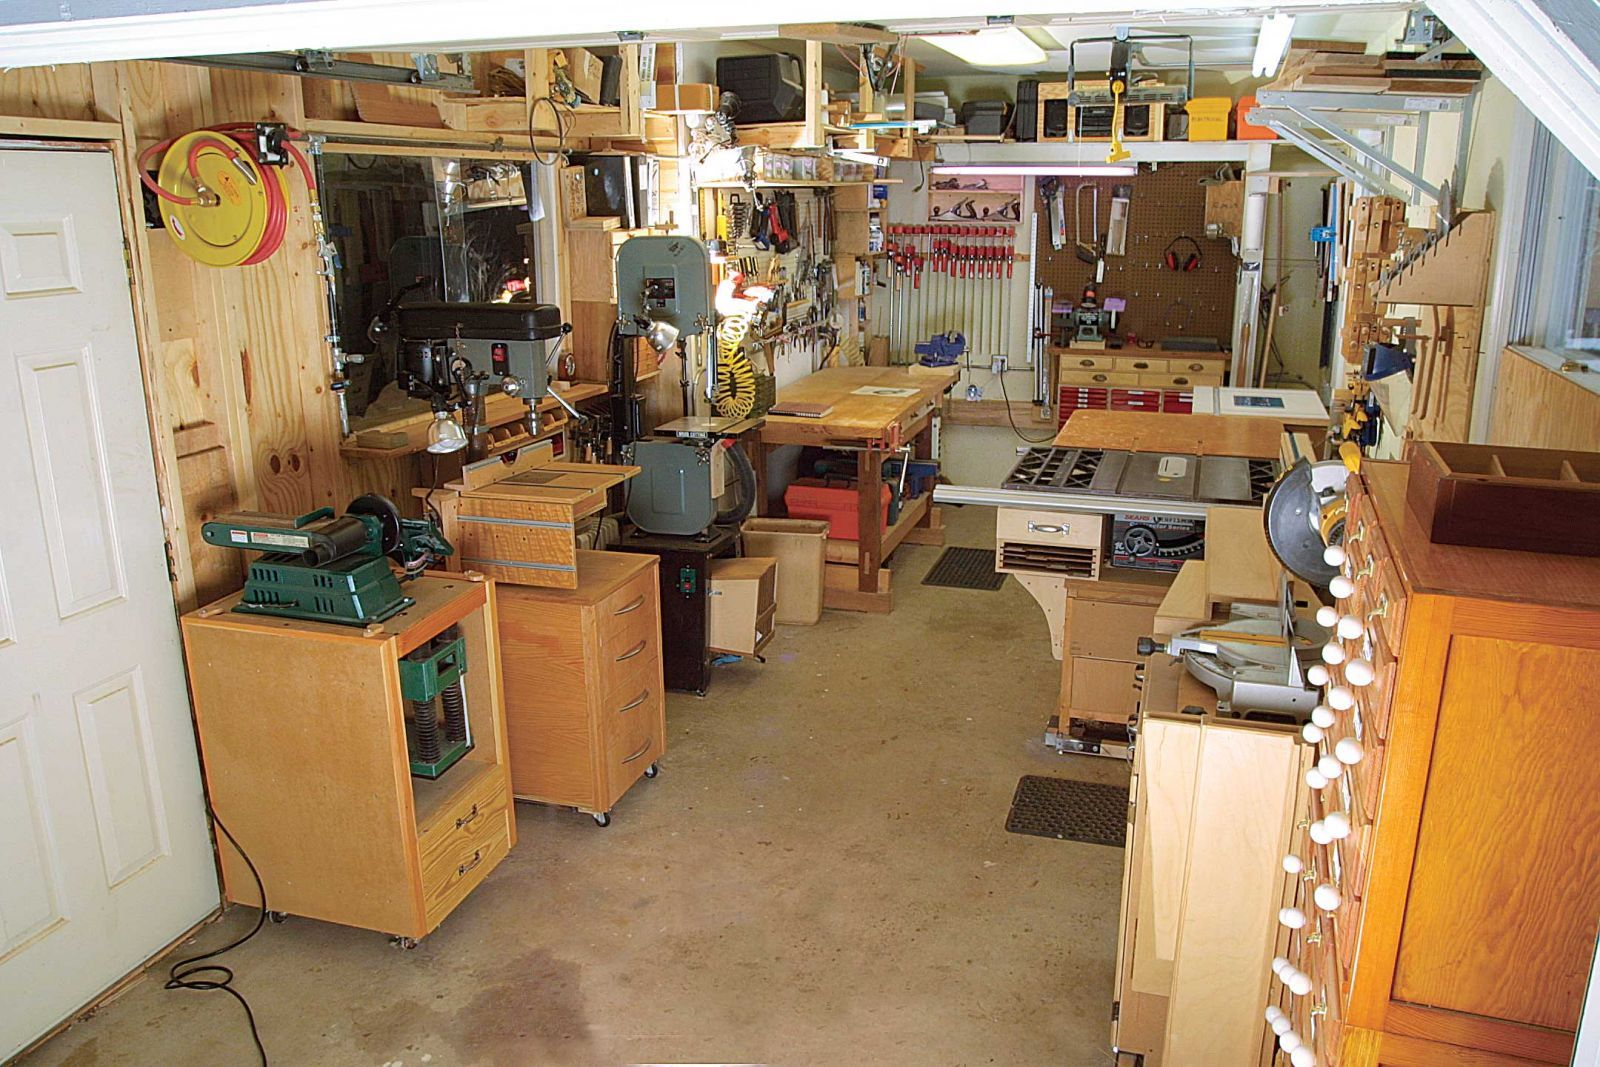 small woodshop layout ideas layout kit startwoodworking com [ 1600 x 1067 Pixel ]